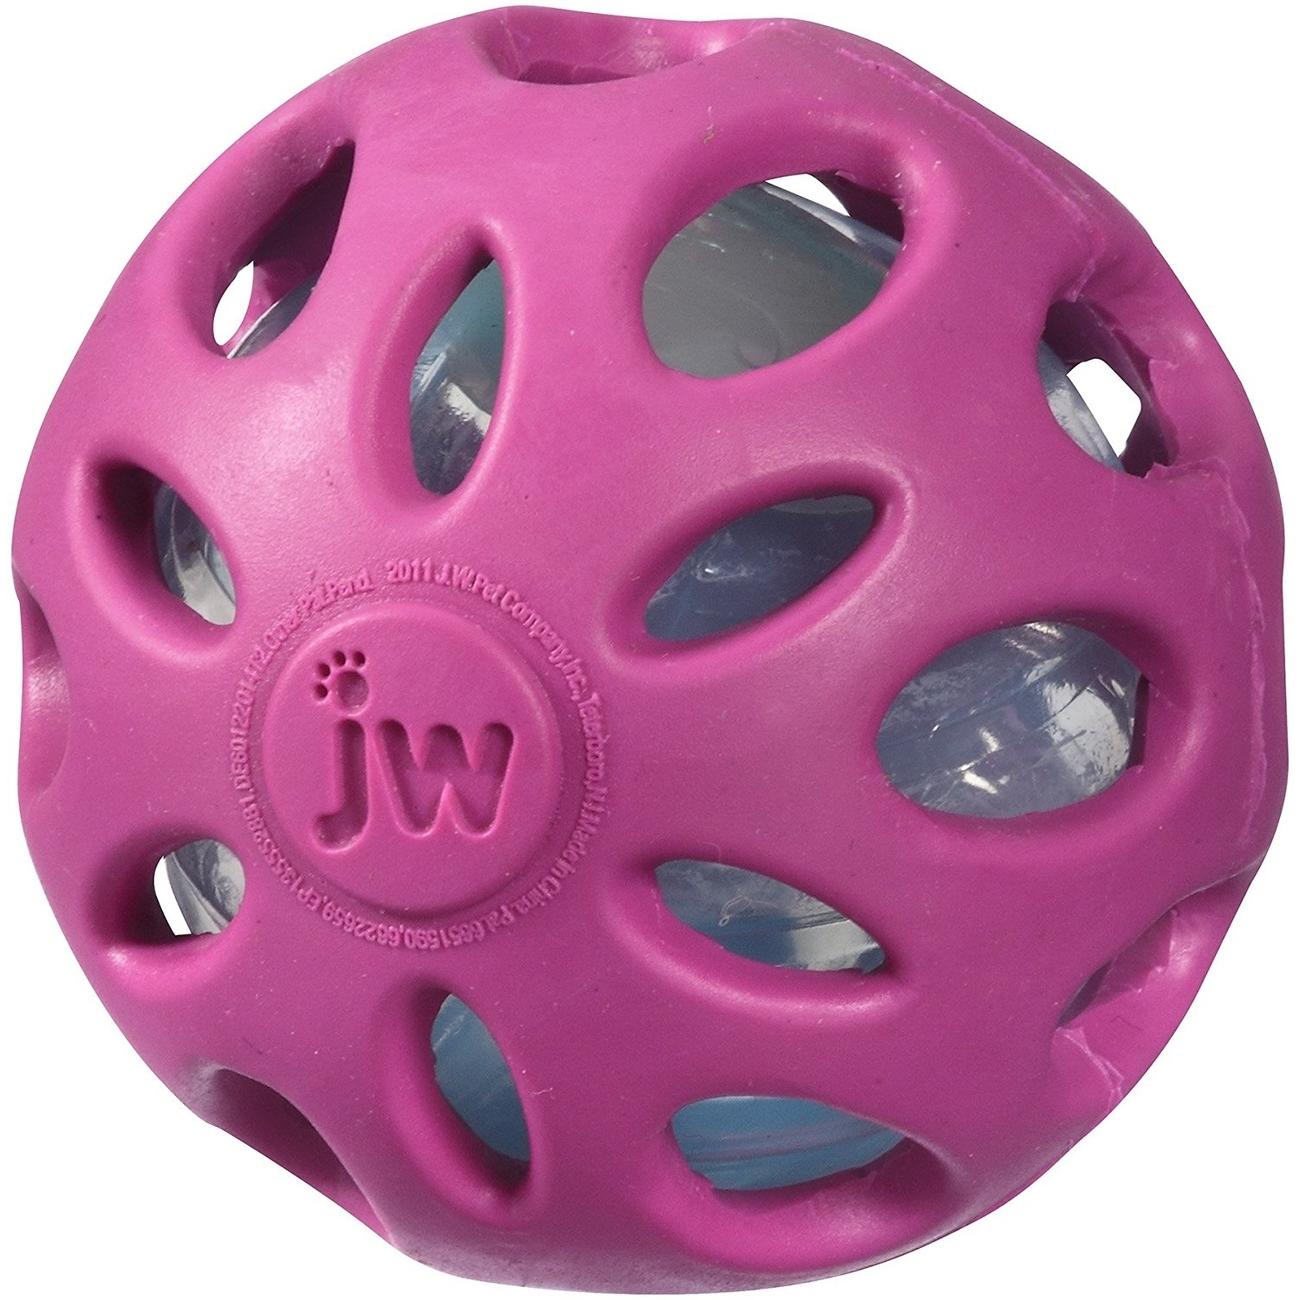 JW Pet Crackle Ball Hundespielzeug, Bild 3